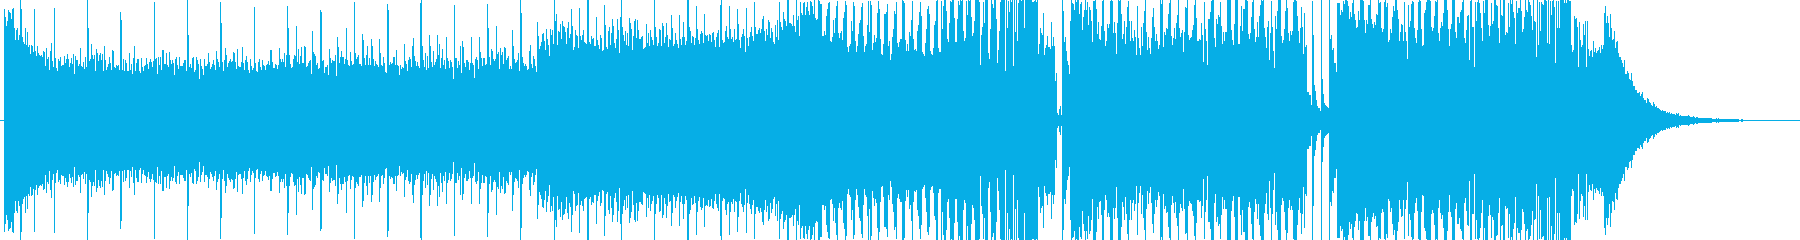 EDMクラブ系ダンスミュージック_3の再生済みの波形